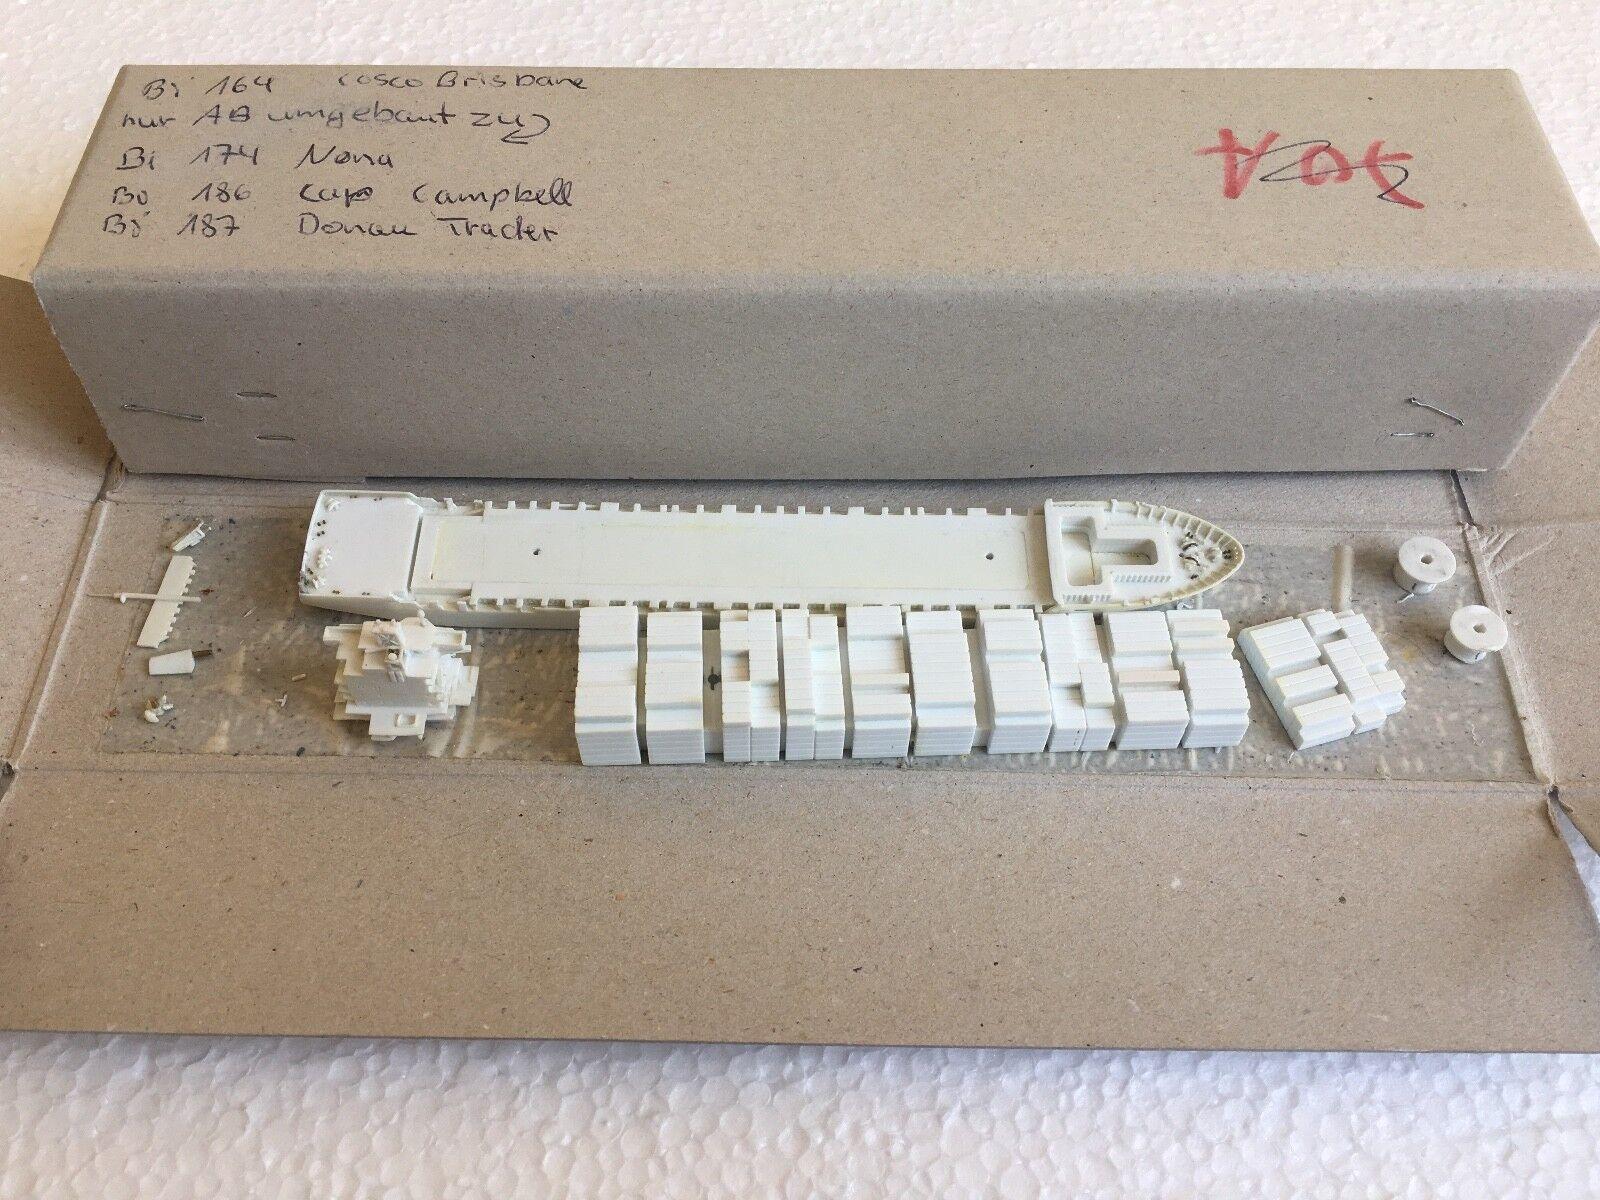 BILLE 174, 186, 187 - Urmodell   master model - 1 1250  | Exquisite (in) Verarbeitung